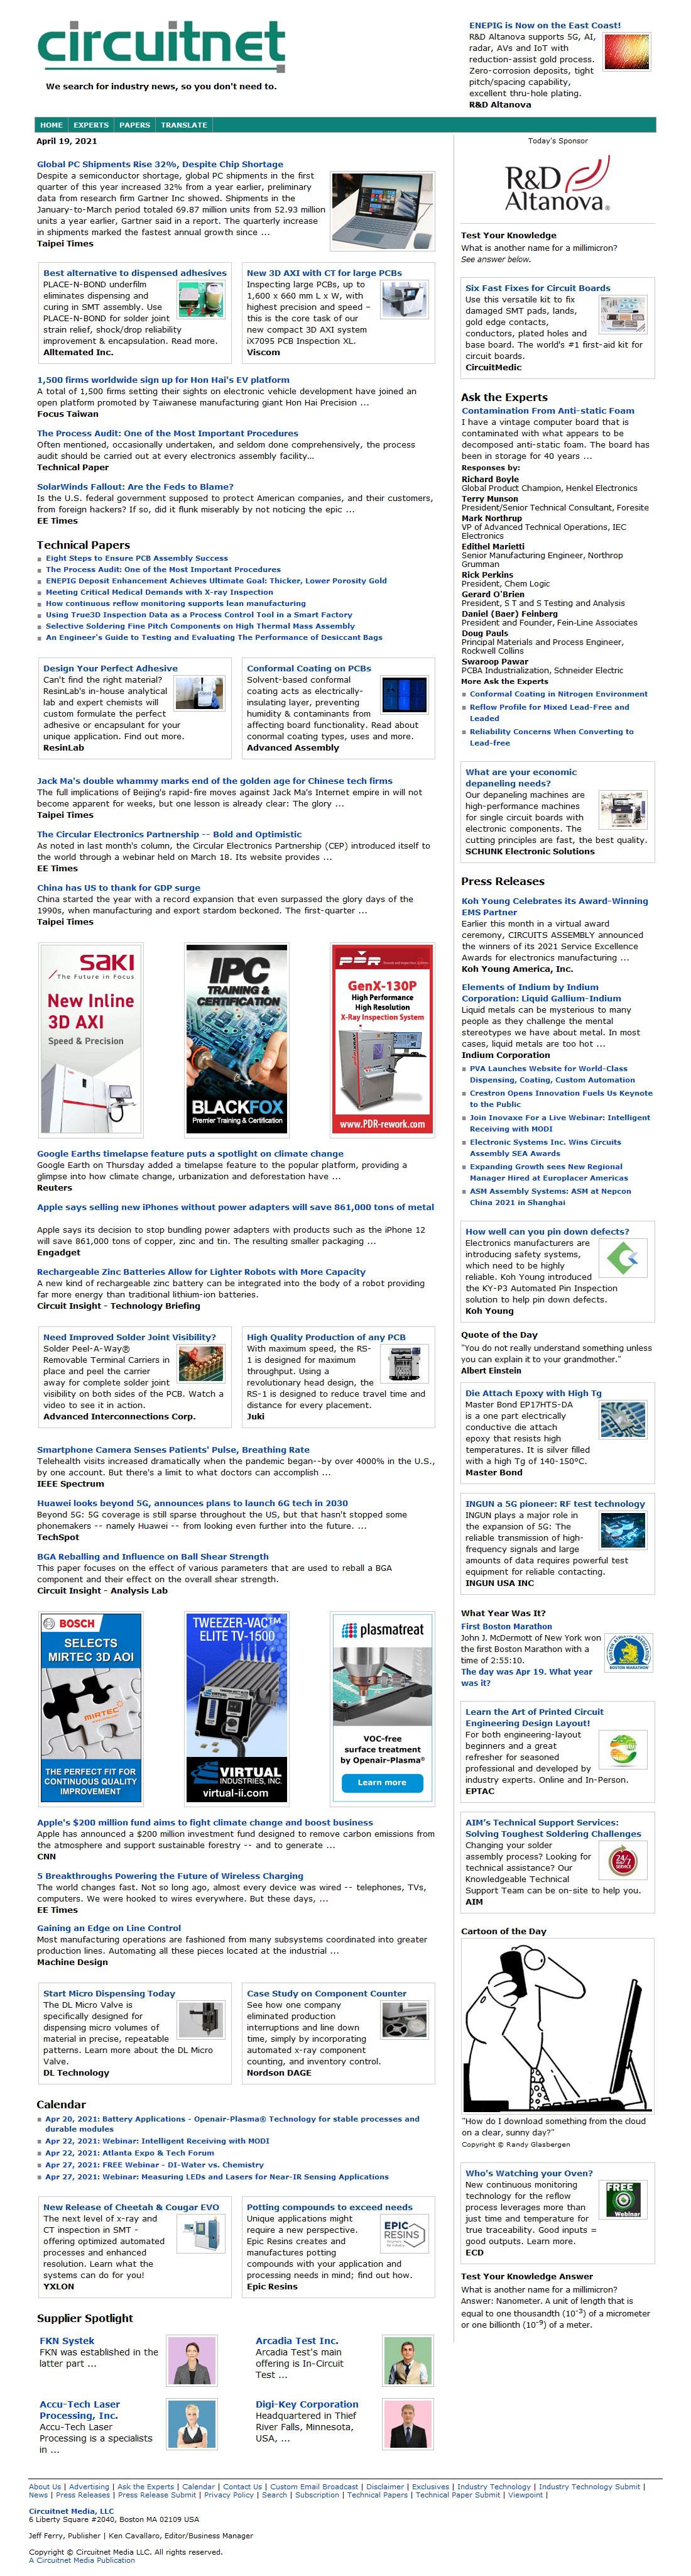 Global PC Shipments Rise 32%, Despite Chip Shortage